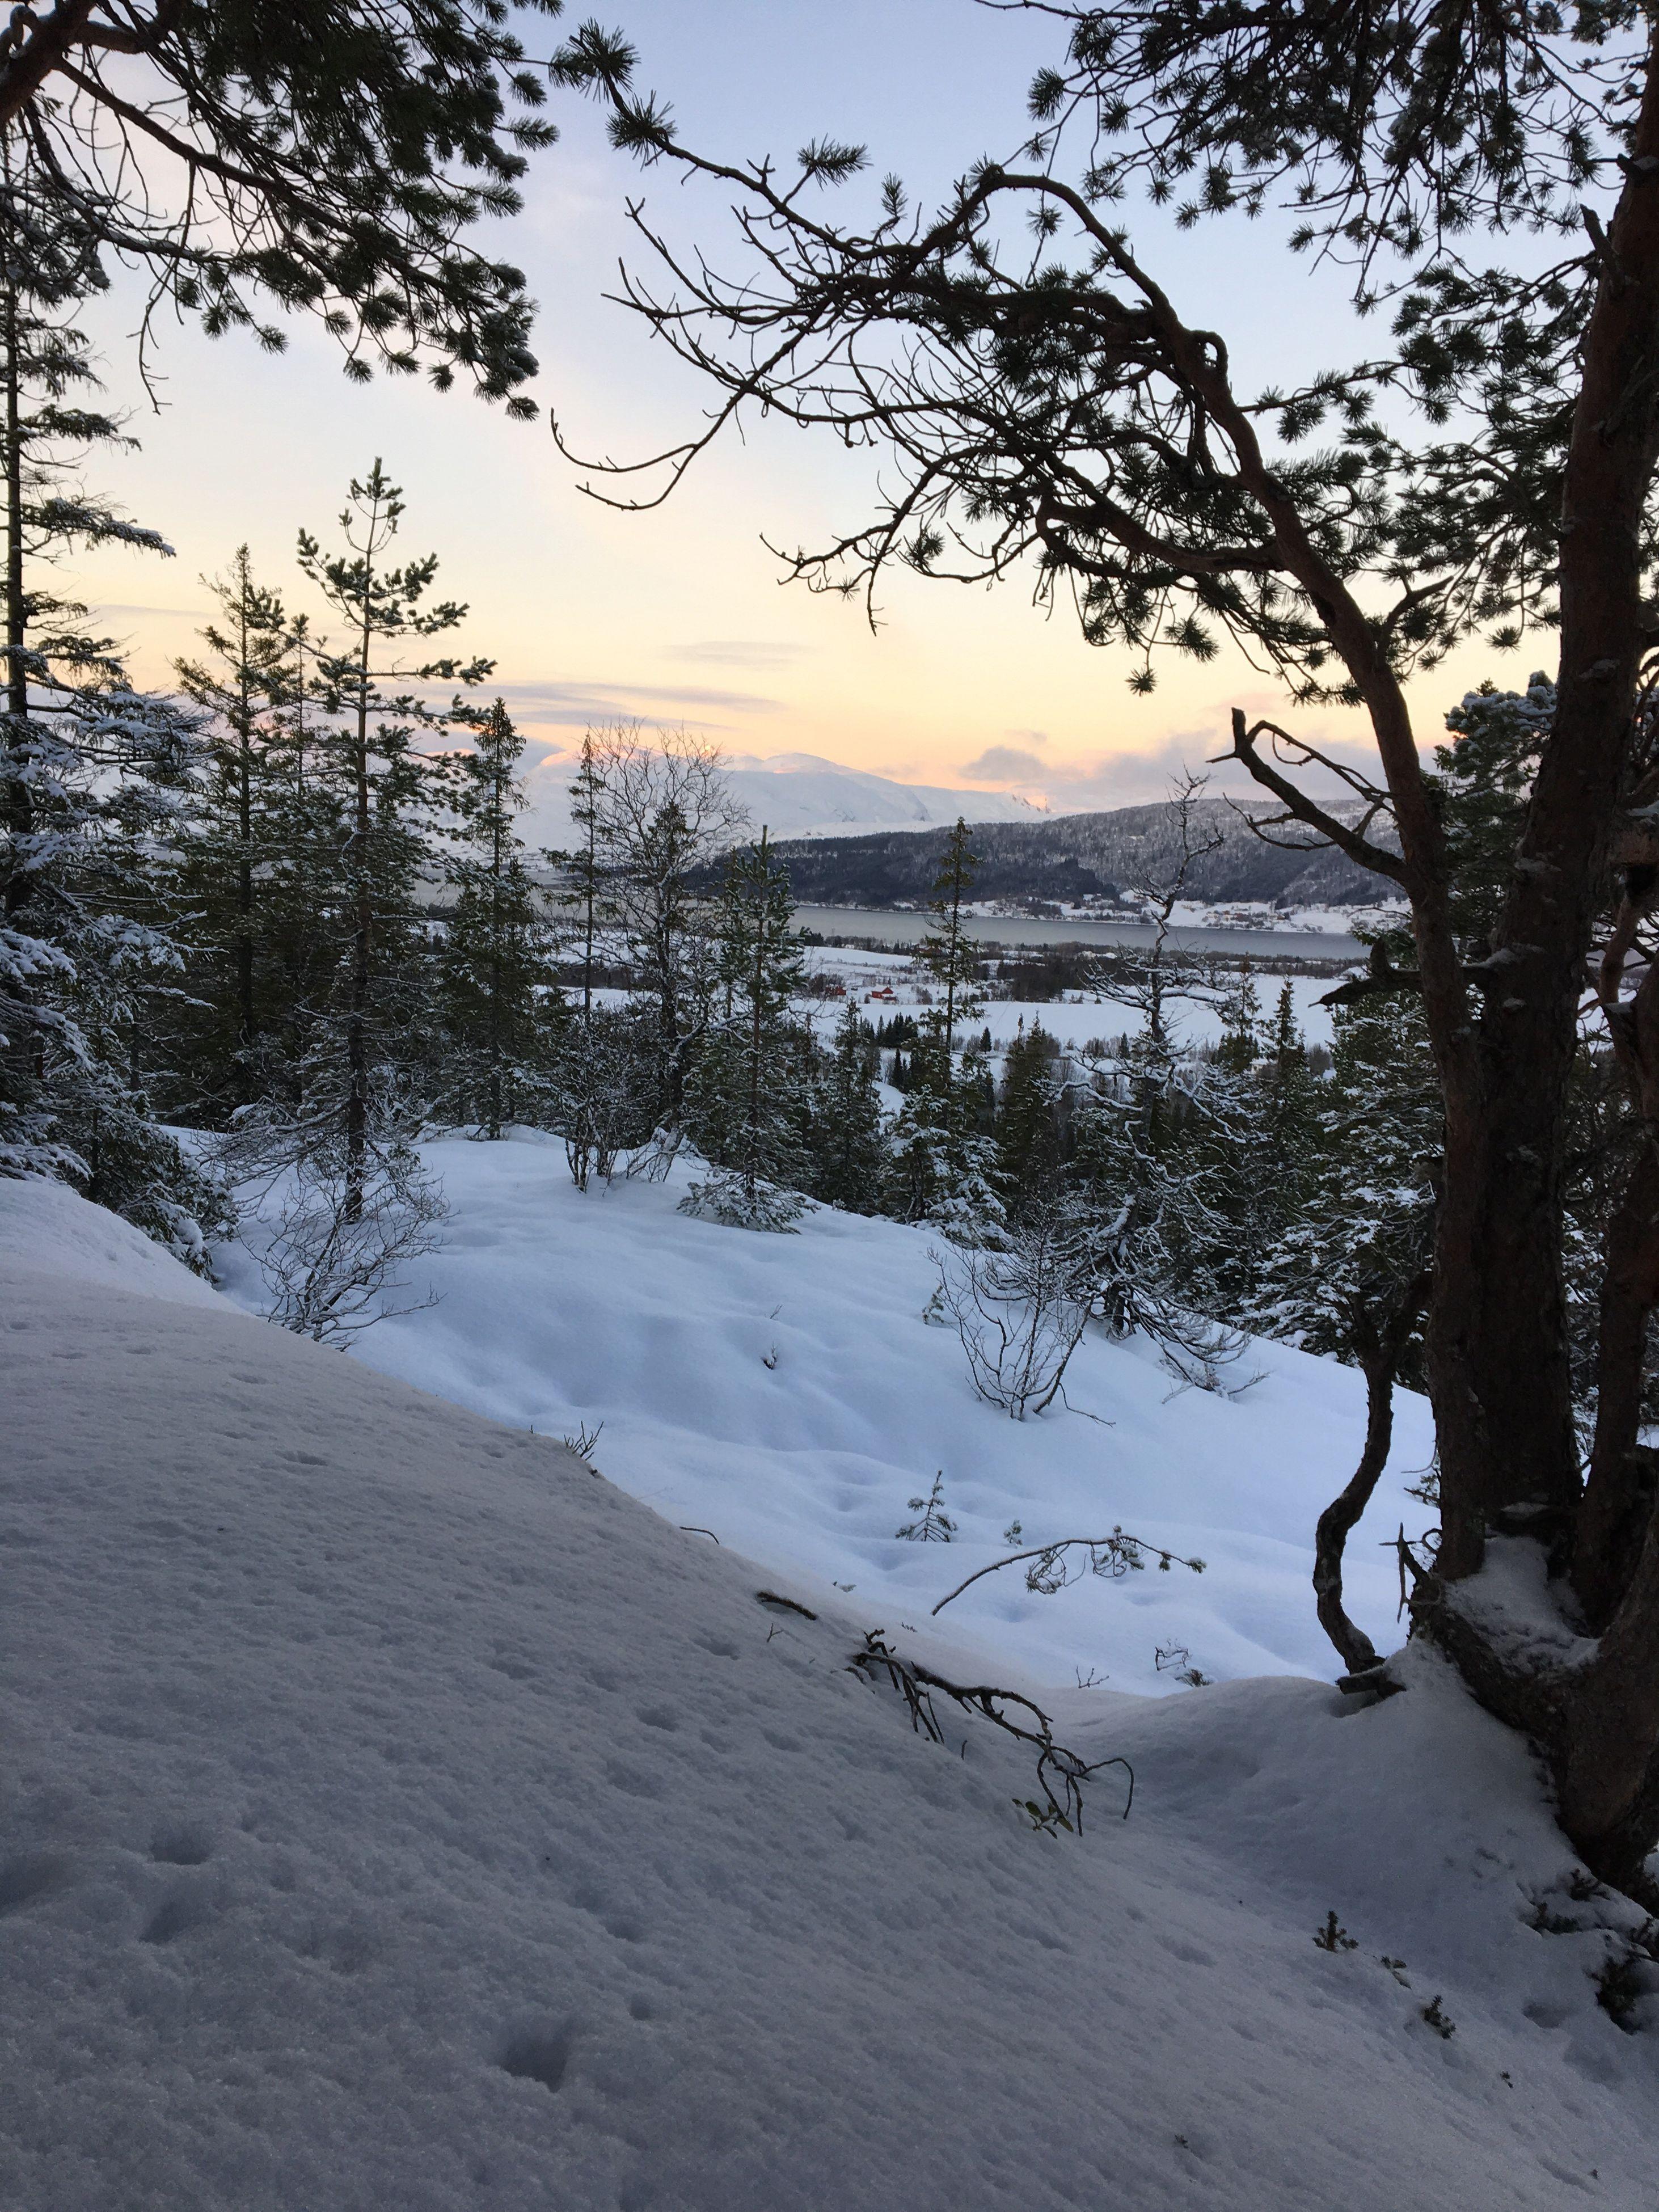 tree, snow, cold temperature, winter, tranquil scene, branch, season, tranquility, scenics, sunset, landscape, sky, nature, beauty in nature, snow covered, non-urban scene, outdoors, solitude, majestic, remote, mountain range, mountain, no people, non urban scene